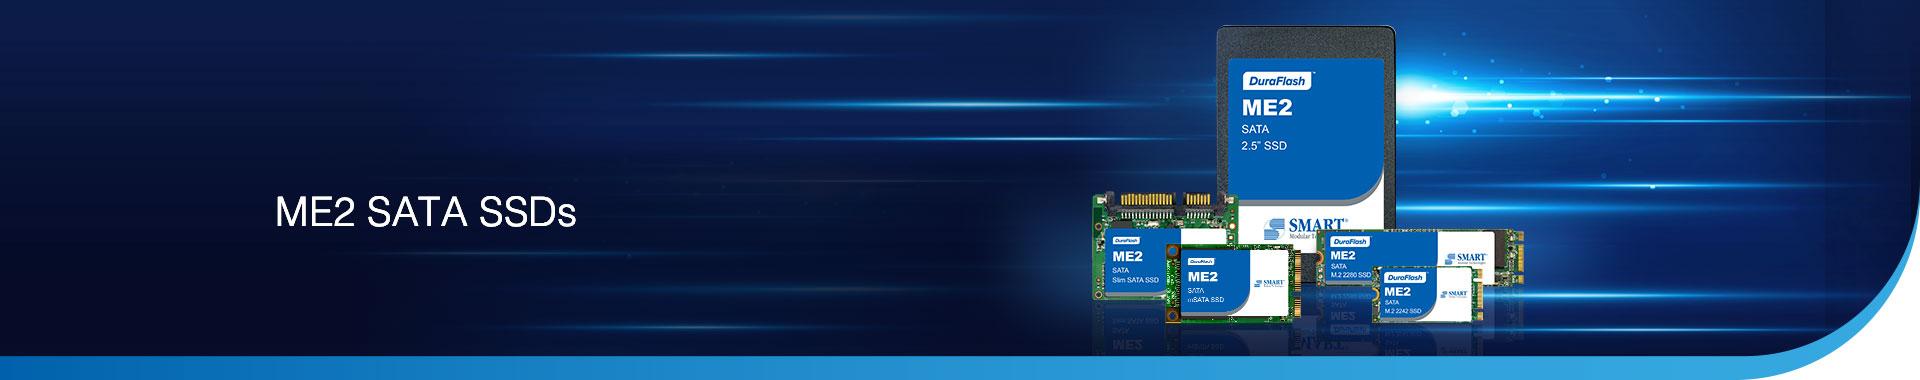 SMART_ME2_SATA_SSD_Product_Family